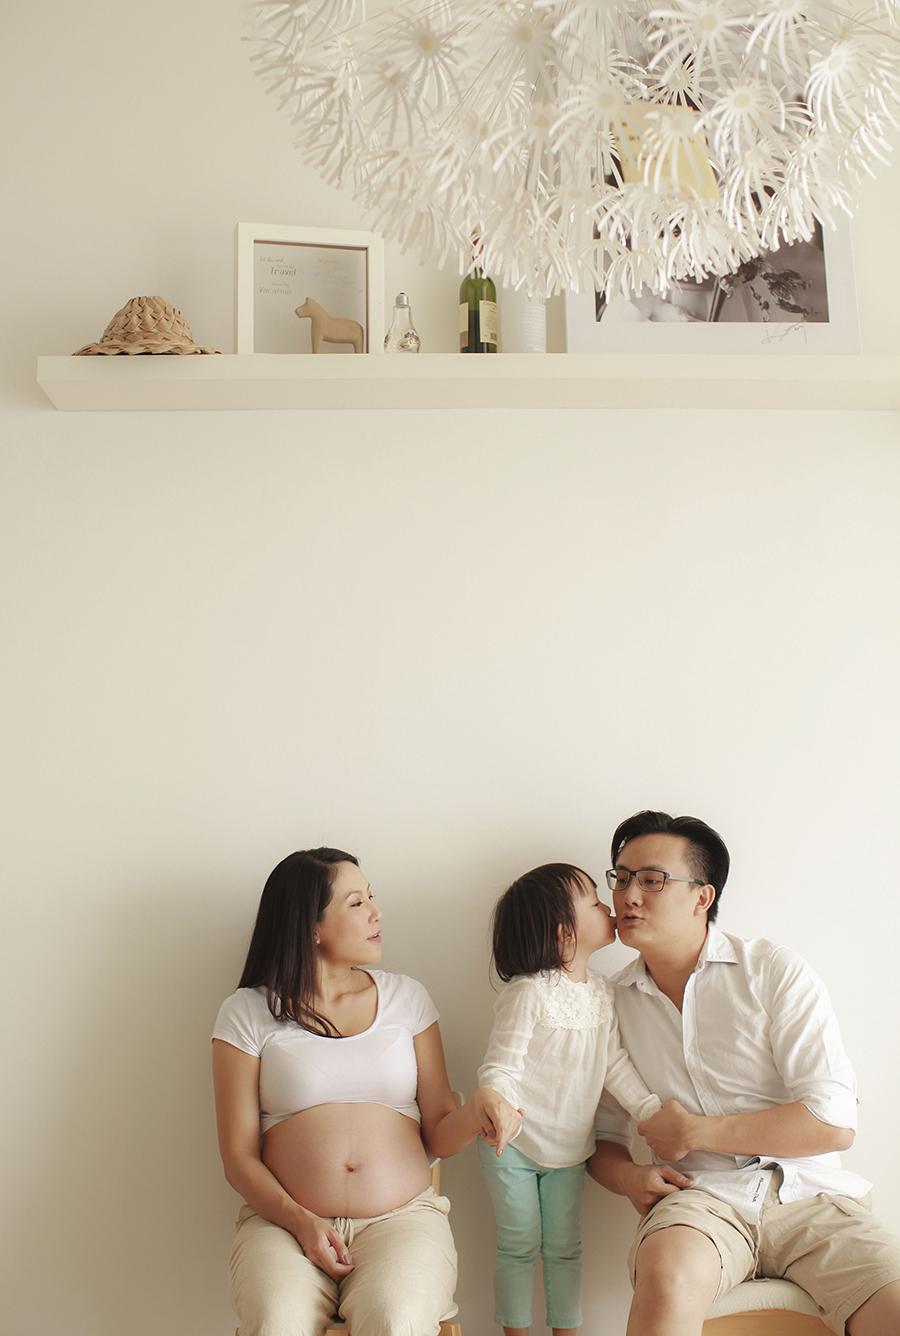 maternity + family portrait photography by kurt ahs . 9123.jpg